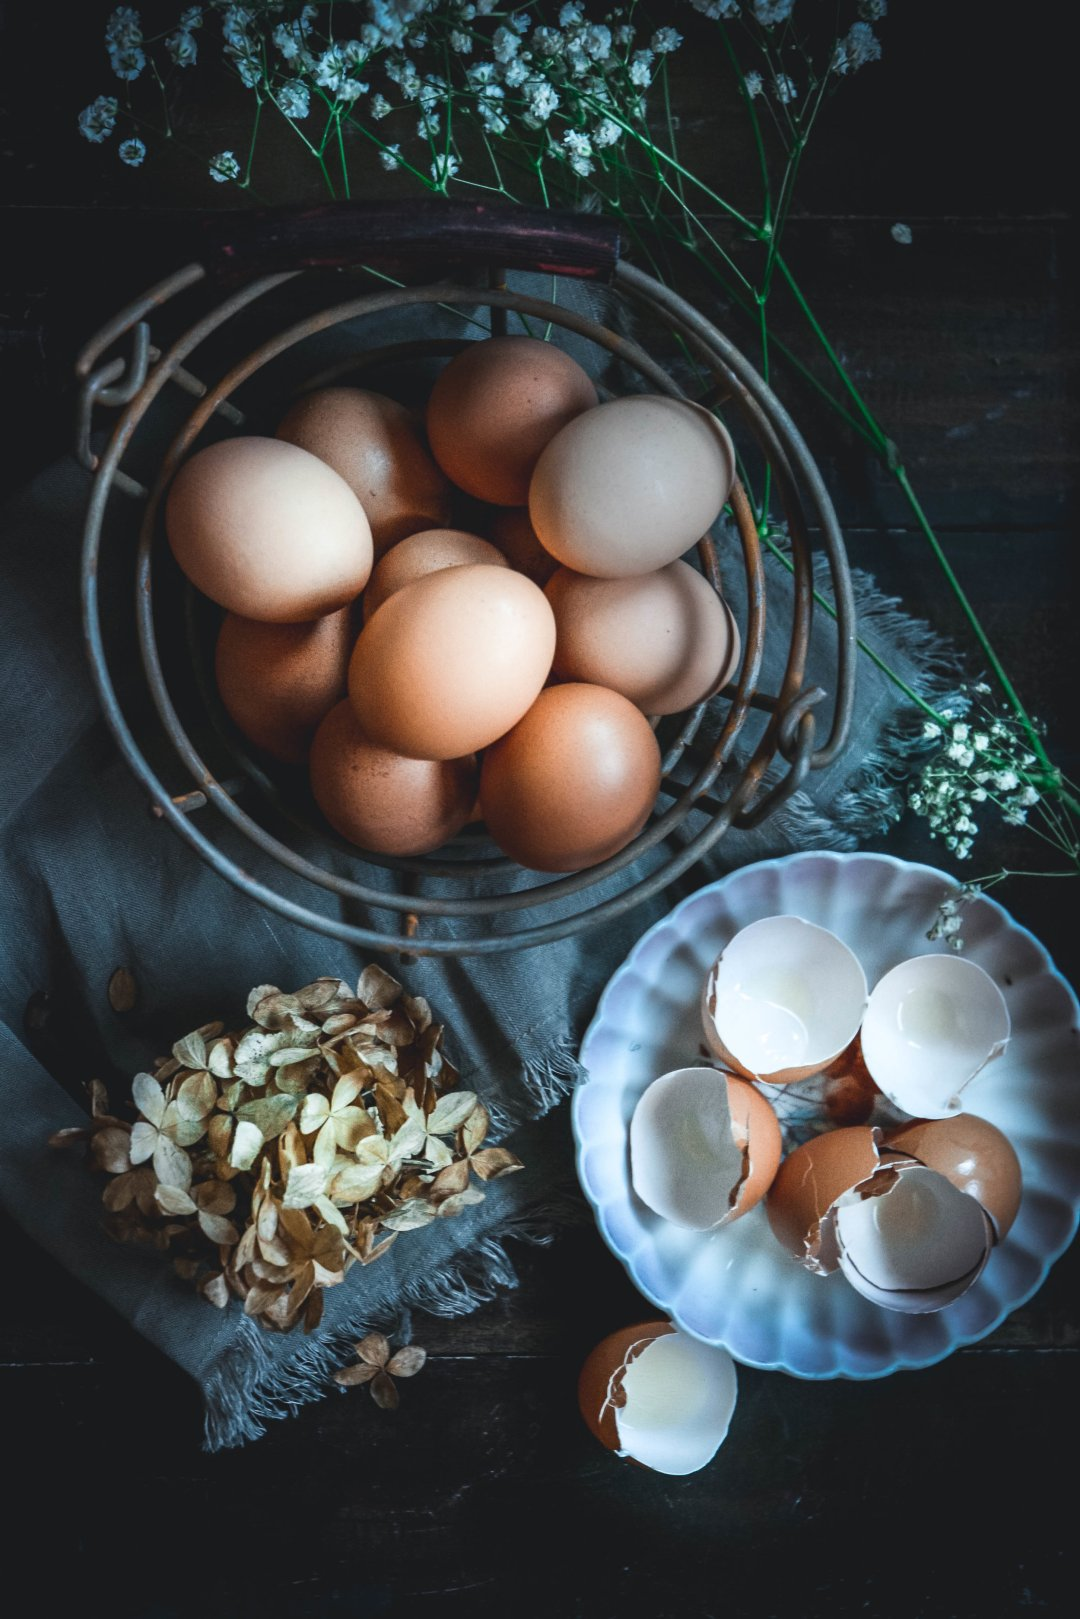 eggs in basket, egg shells on plate, dried hydrangea, baby's breath flowers